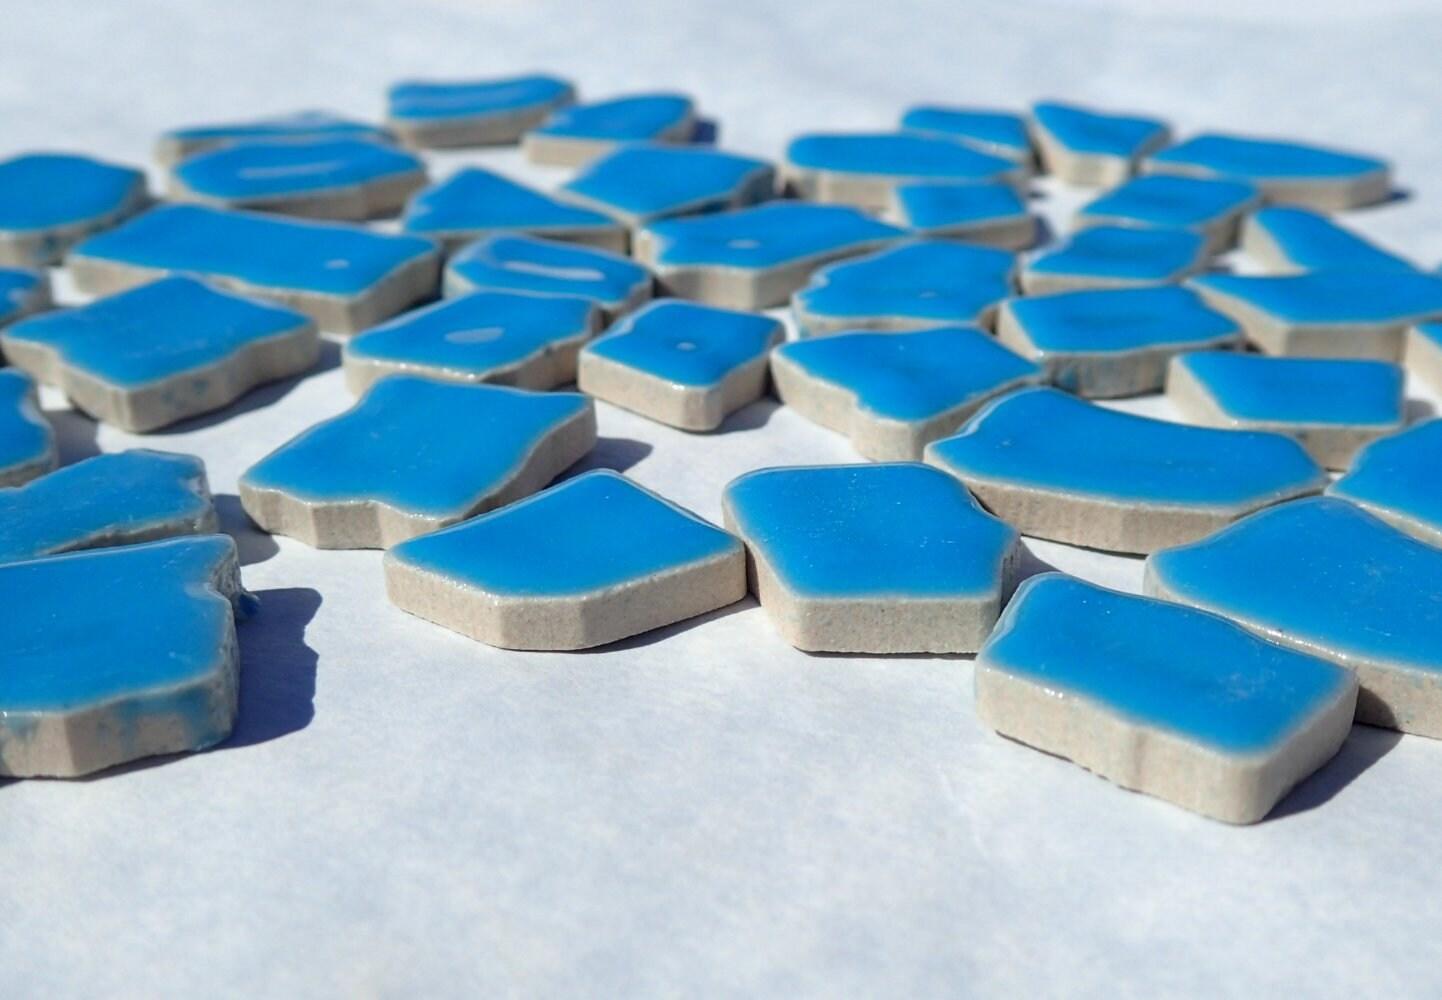 Mediterranean Blue Mosaic Ceramic Tiles - Jigsaw Puzzle Shaped ...